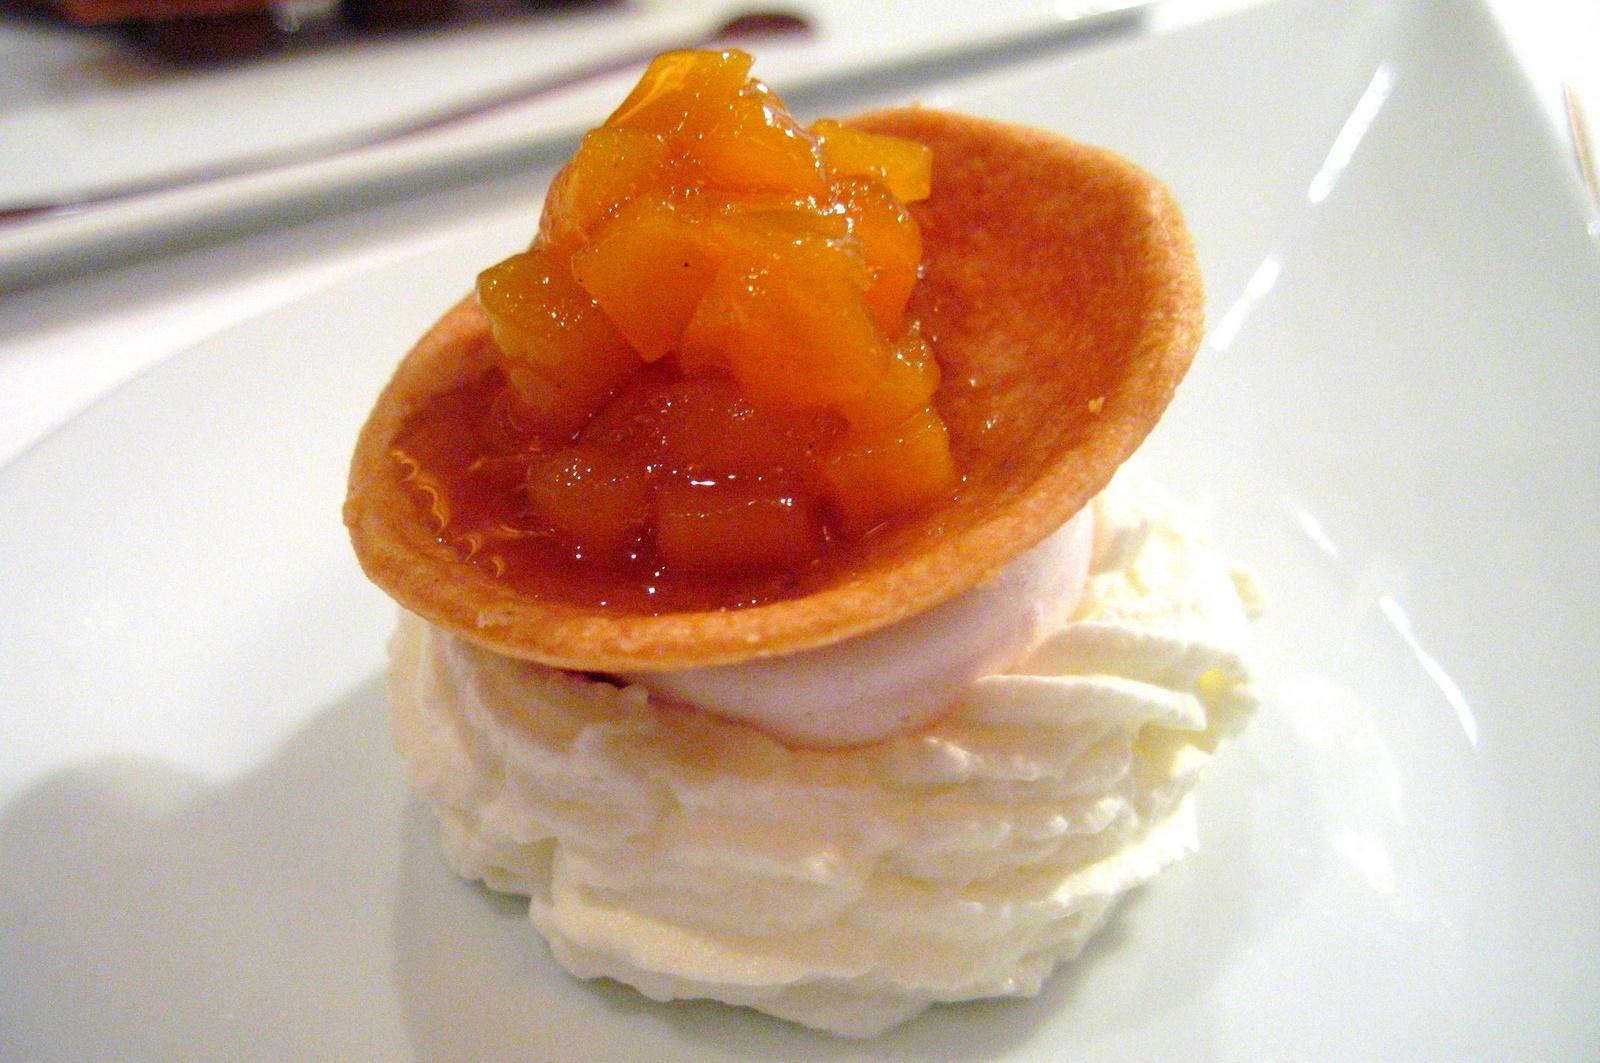 Pierre Gagnaire, Paris - Raspberry meringue, chantilly, raspberry confiture, fresh mango tart